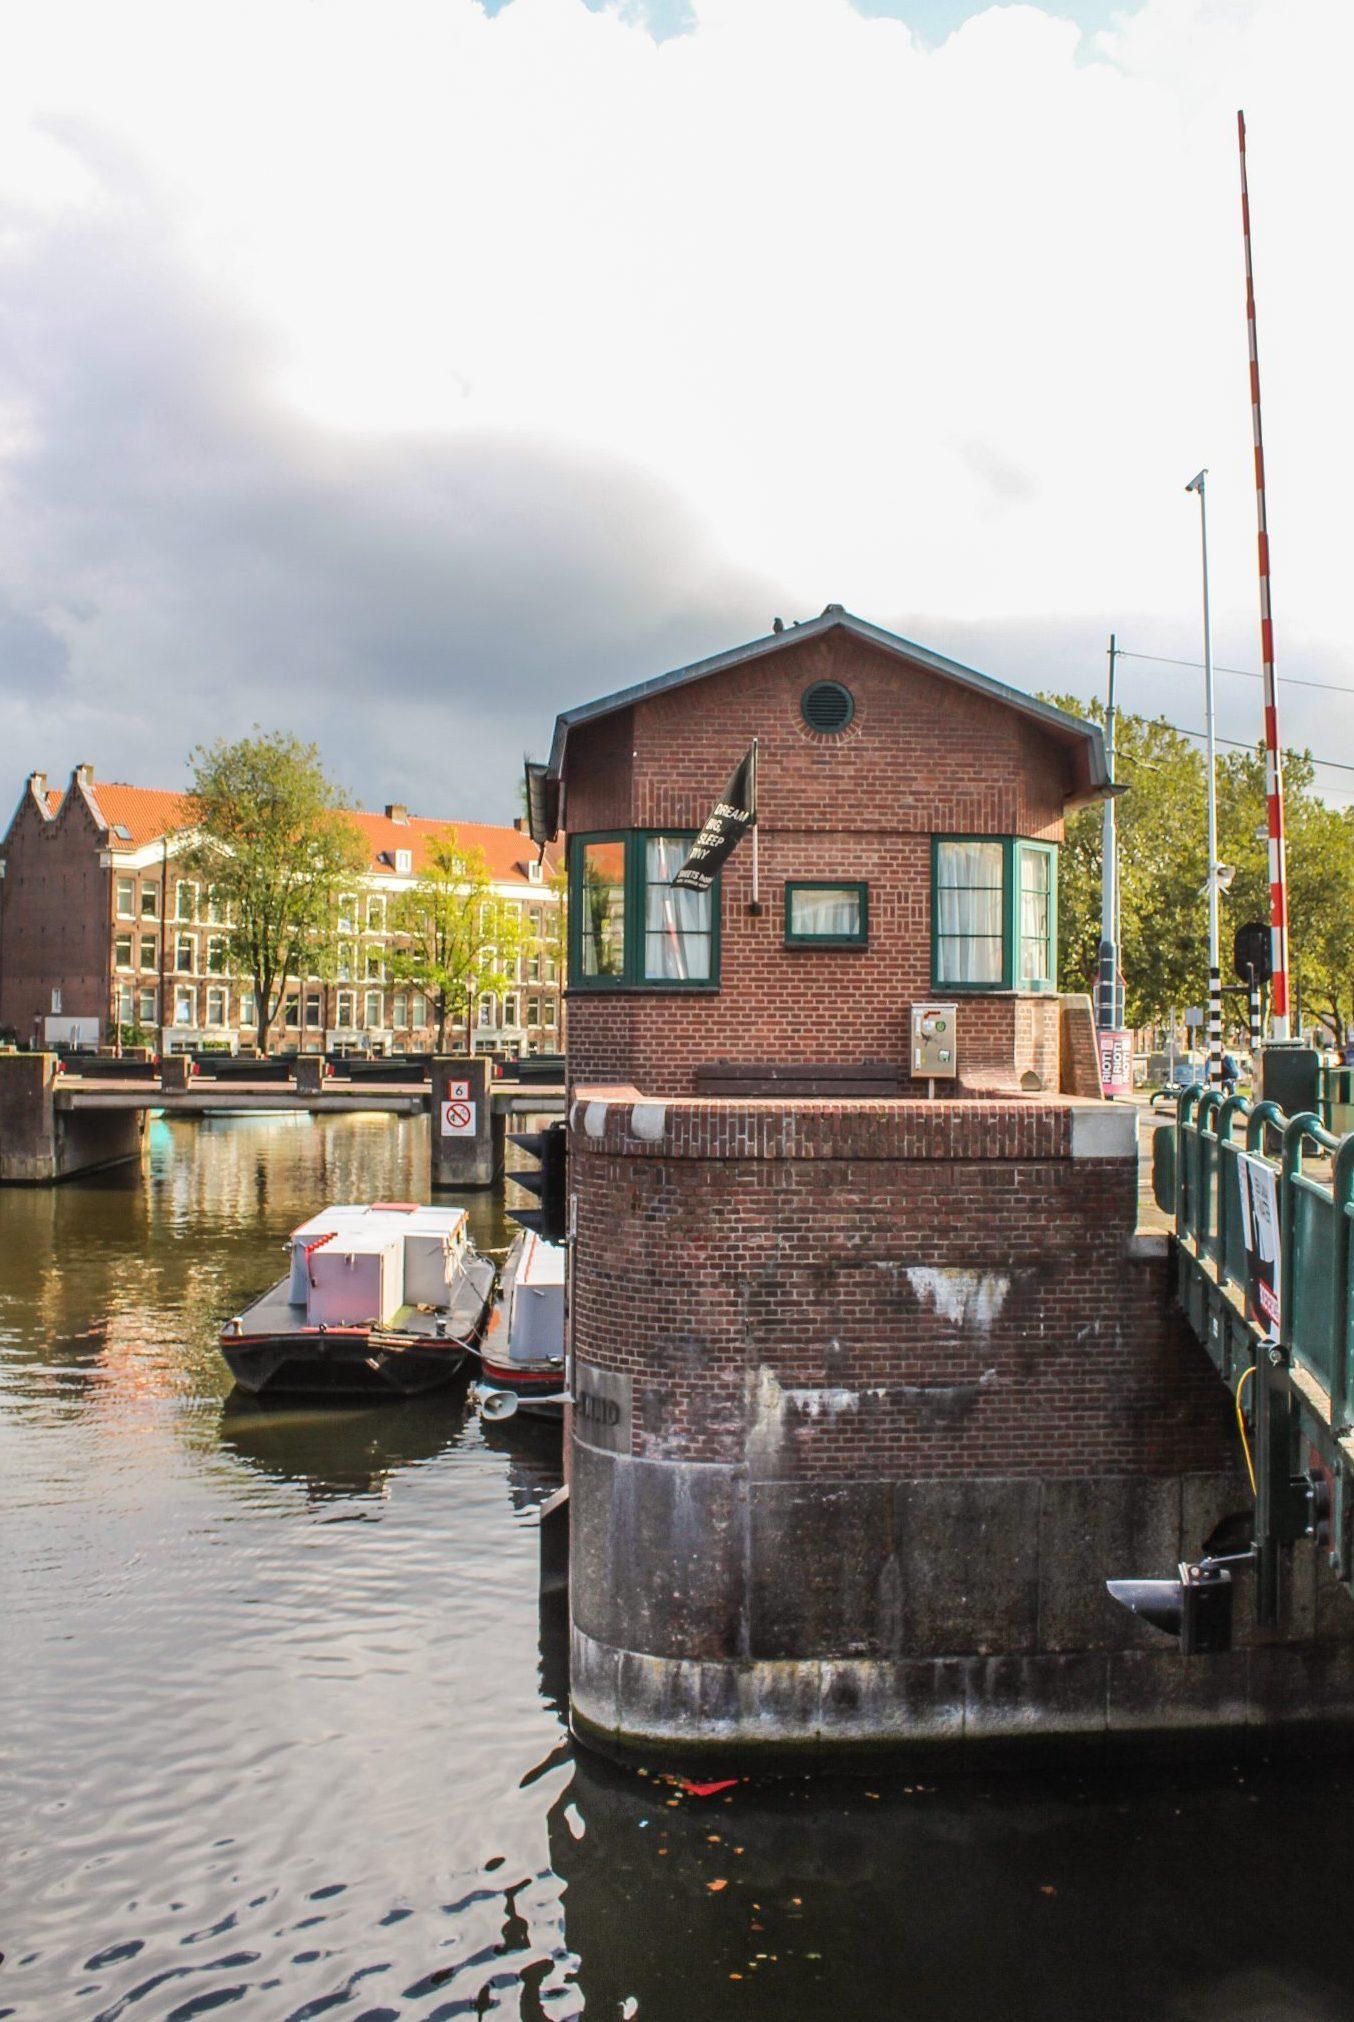 SWEETS hotel Amsterdam brohus centralt hotel i Amsterdam husbåd kanal